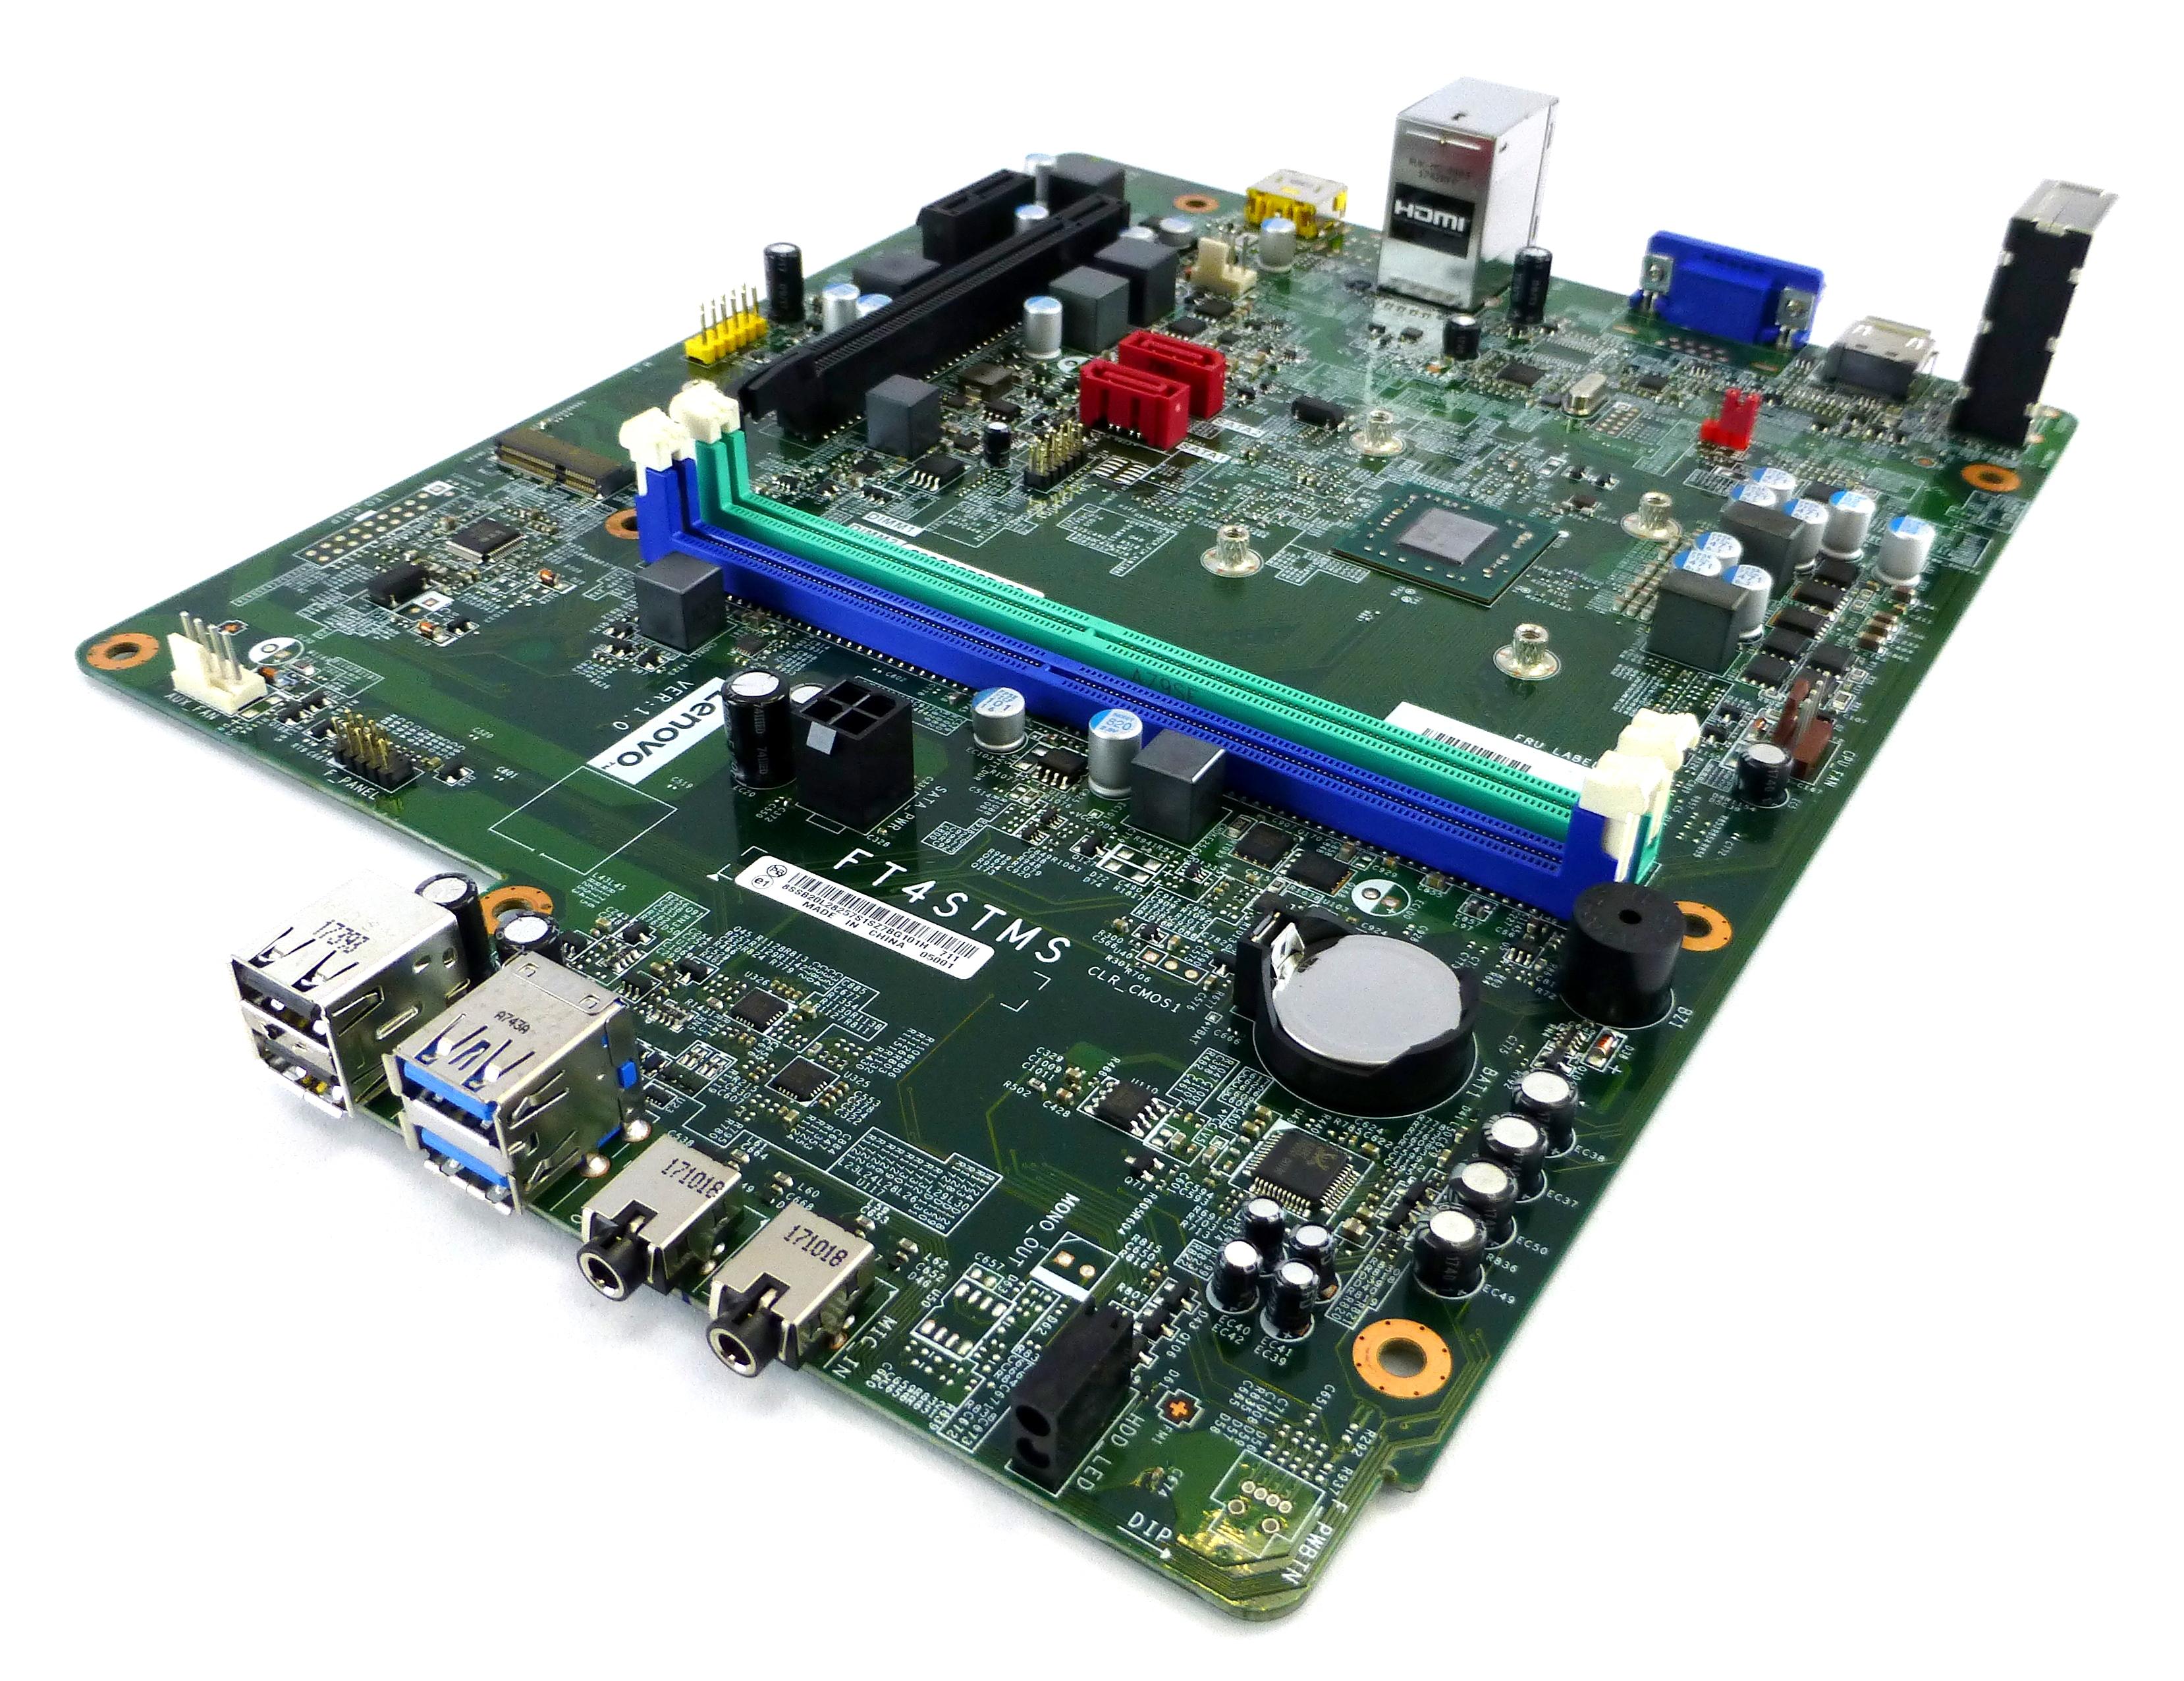 00XK158 Lenovo ideacentre FT4STMS Motherboard SB20L28257S w/ AMD A9-9430 APU